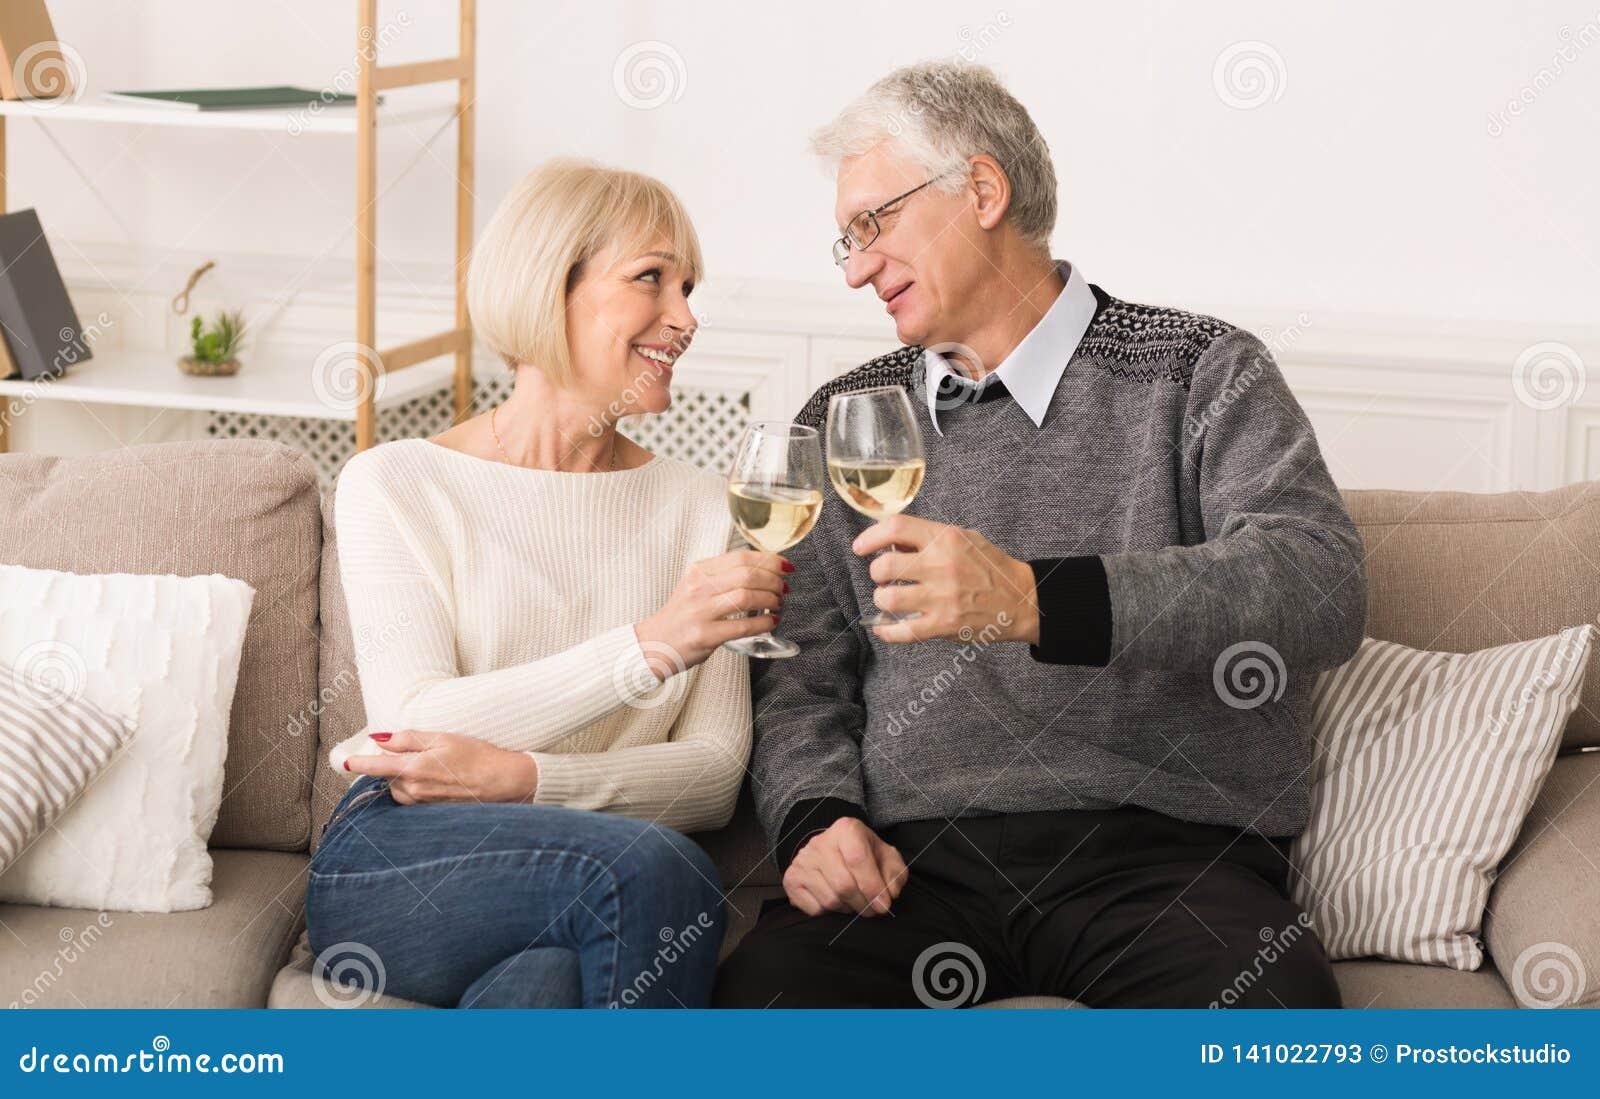 Happy senior couple drinking wine, celebrating wedding anniversary